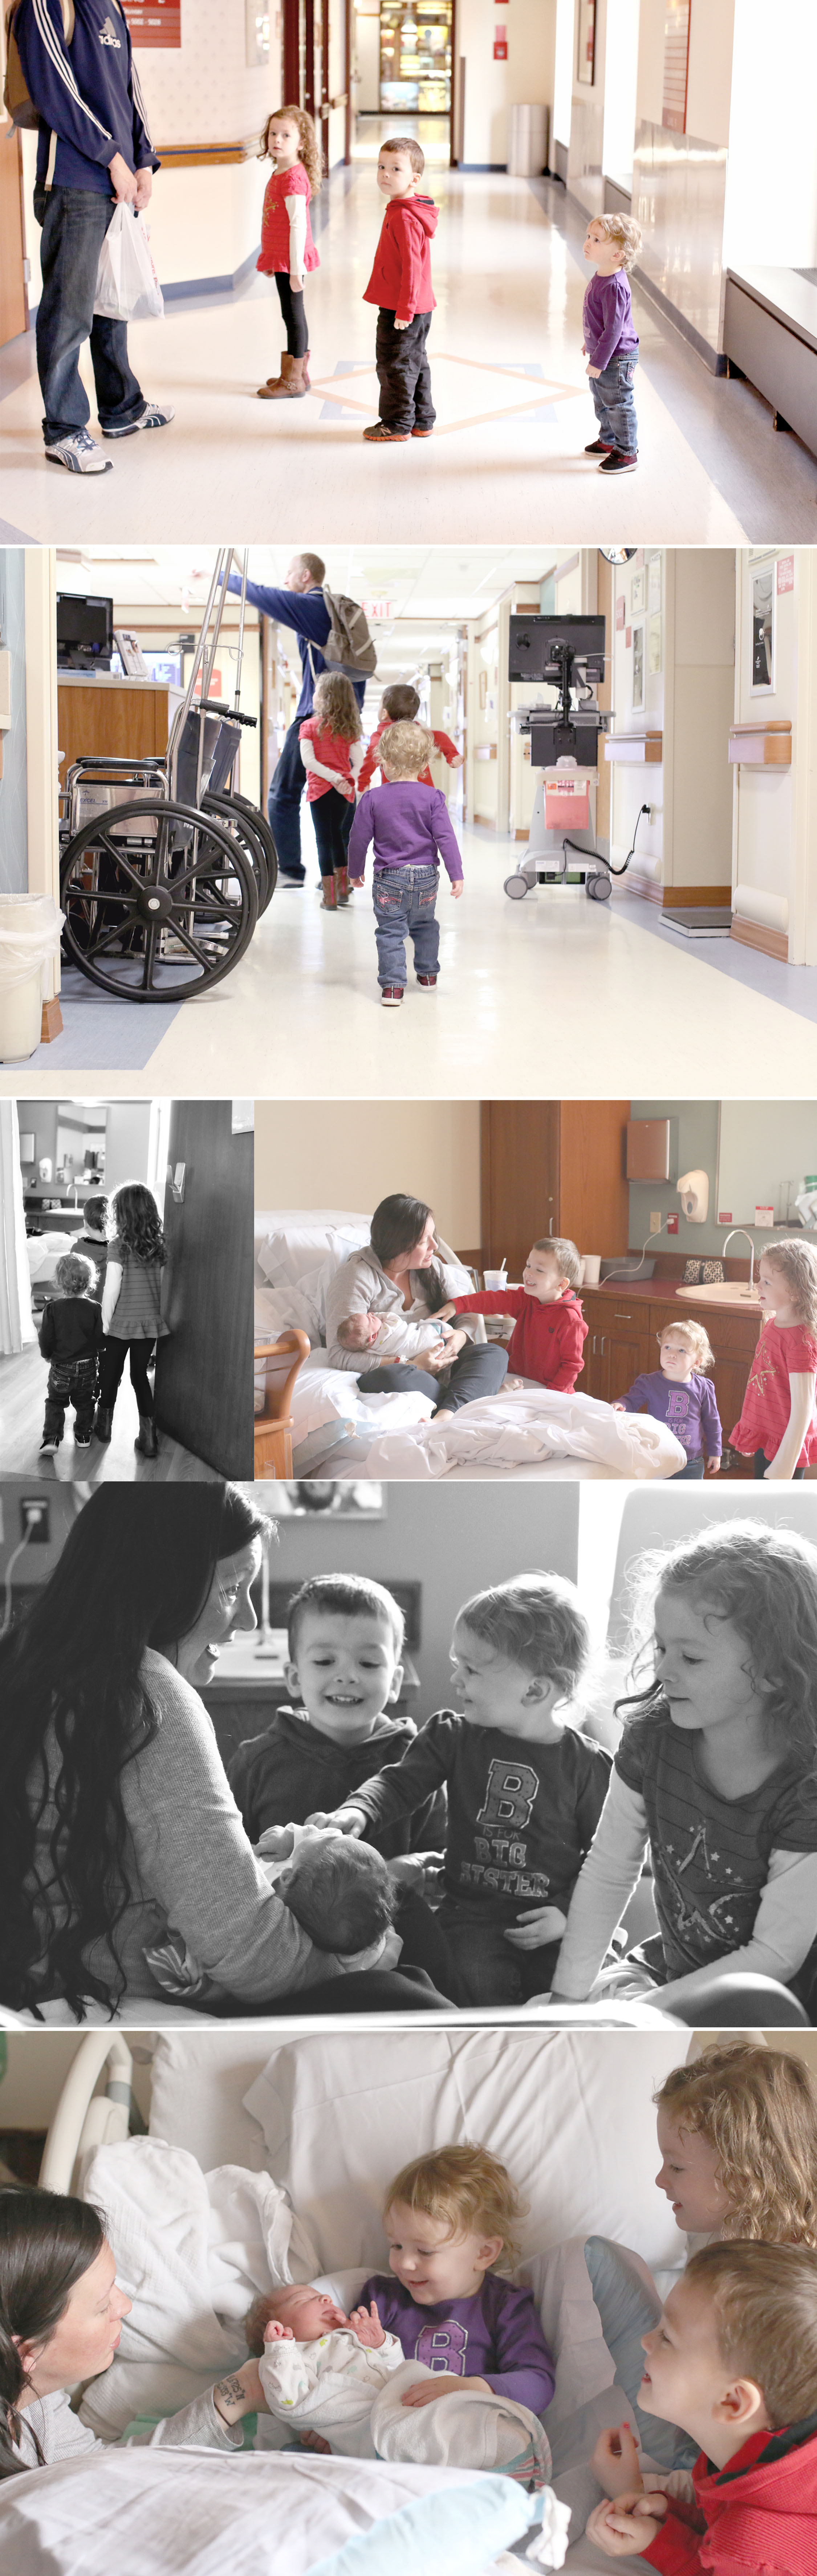 dawson hospital meet siblings3